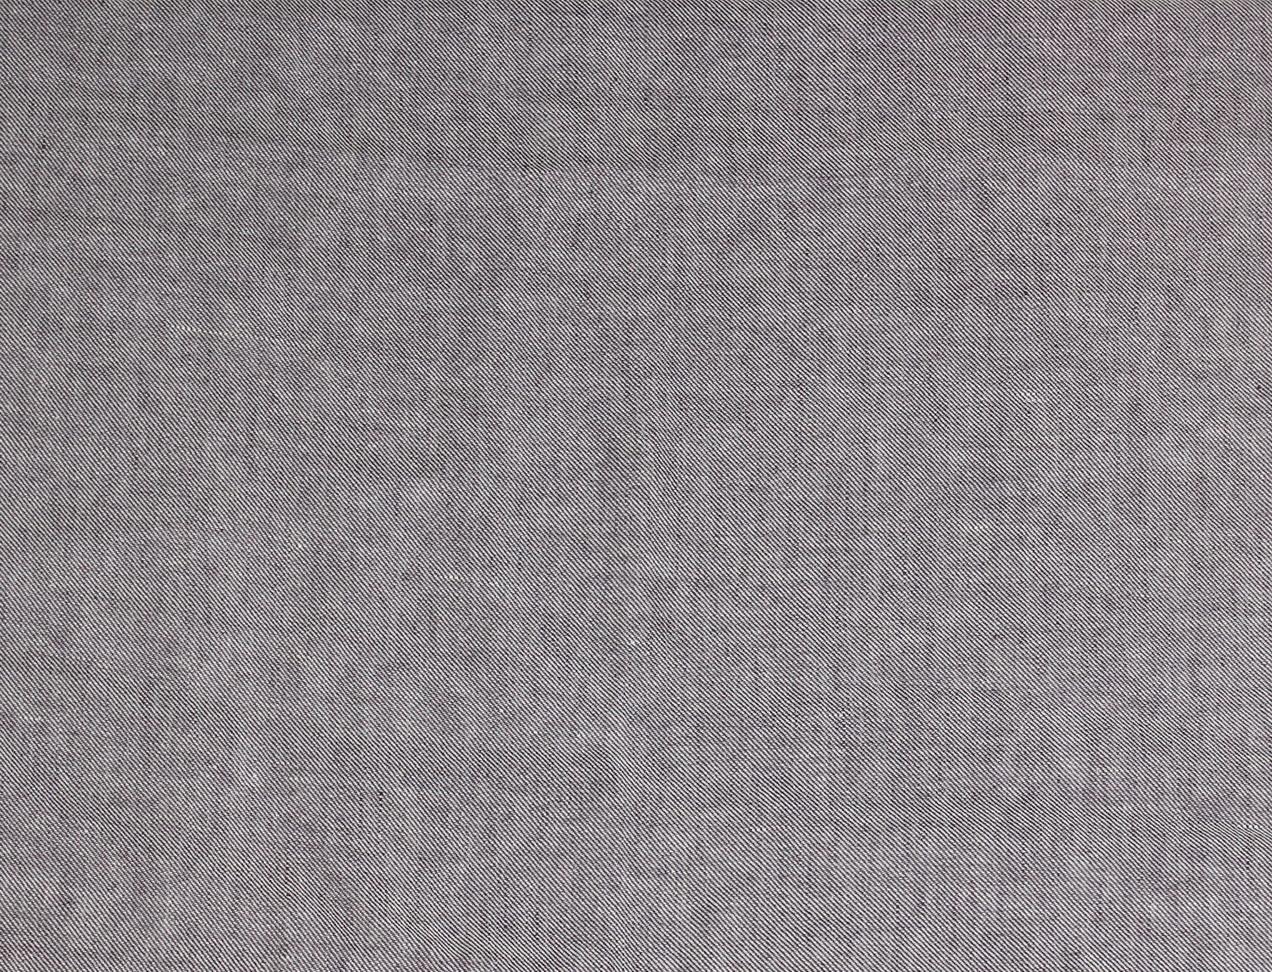 CASTELLINO TWILL MACHE' White/Plum